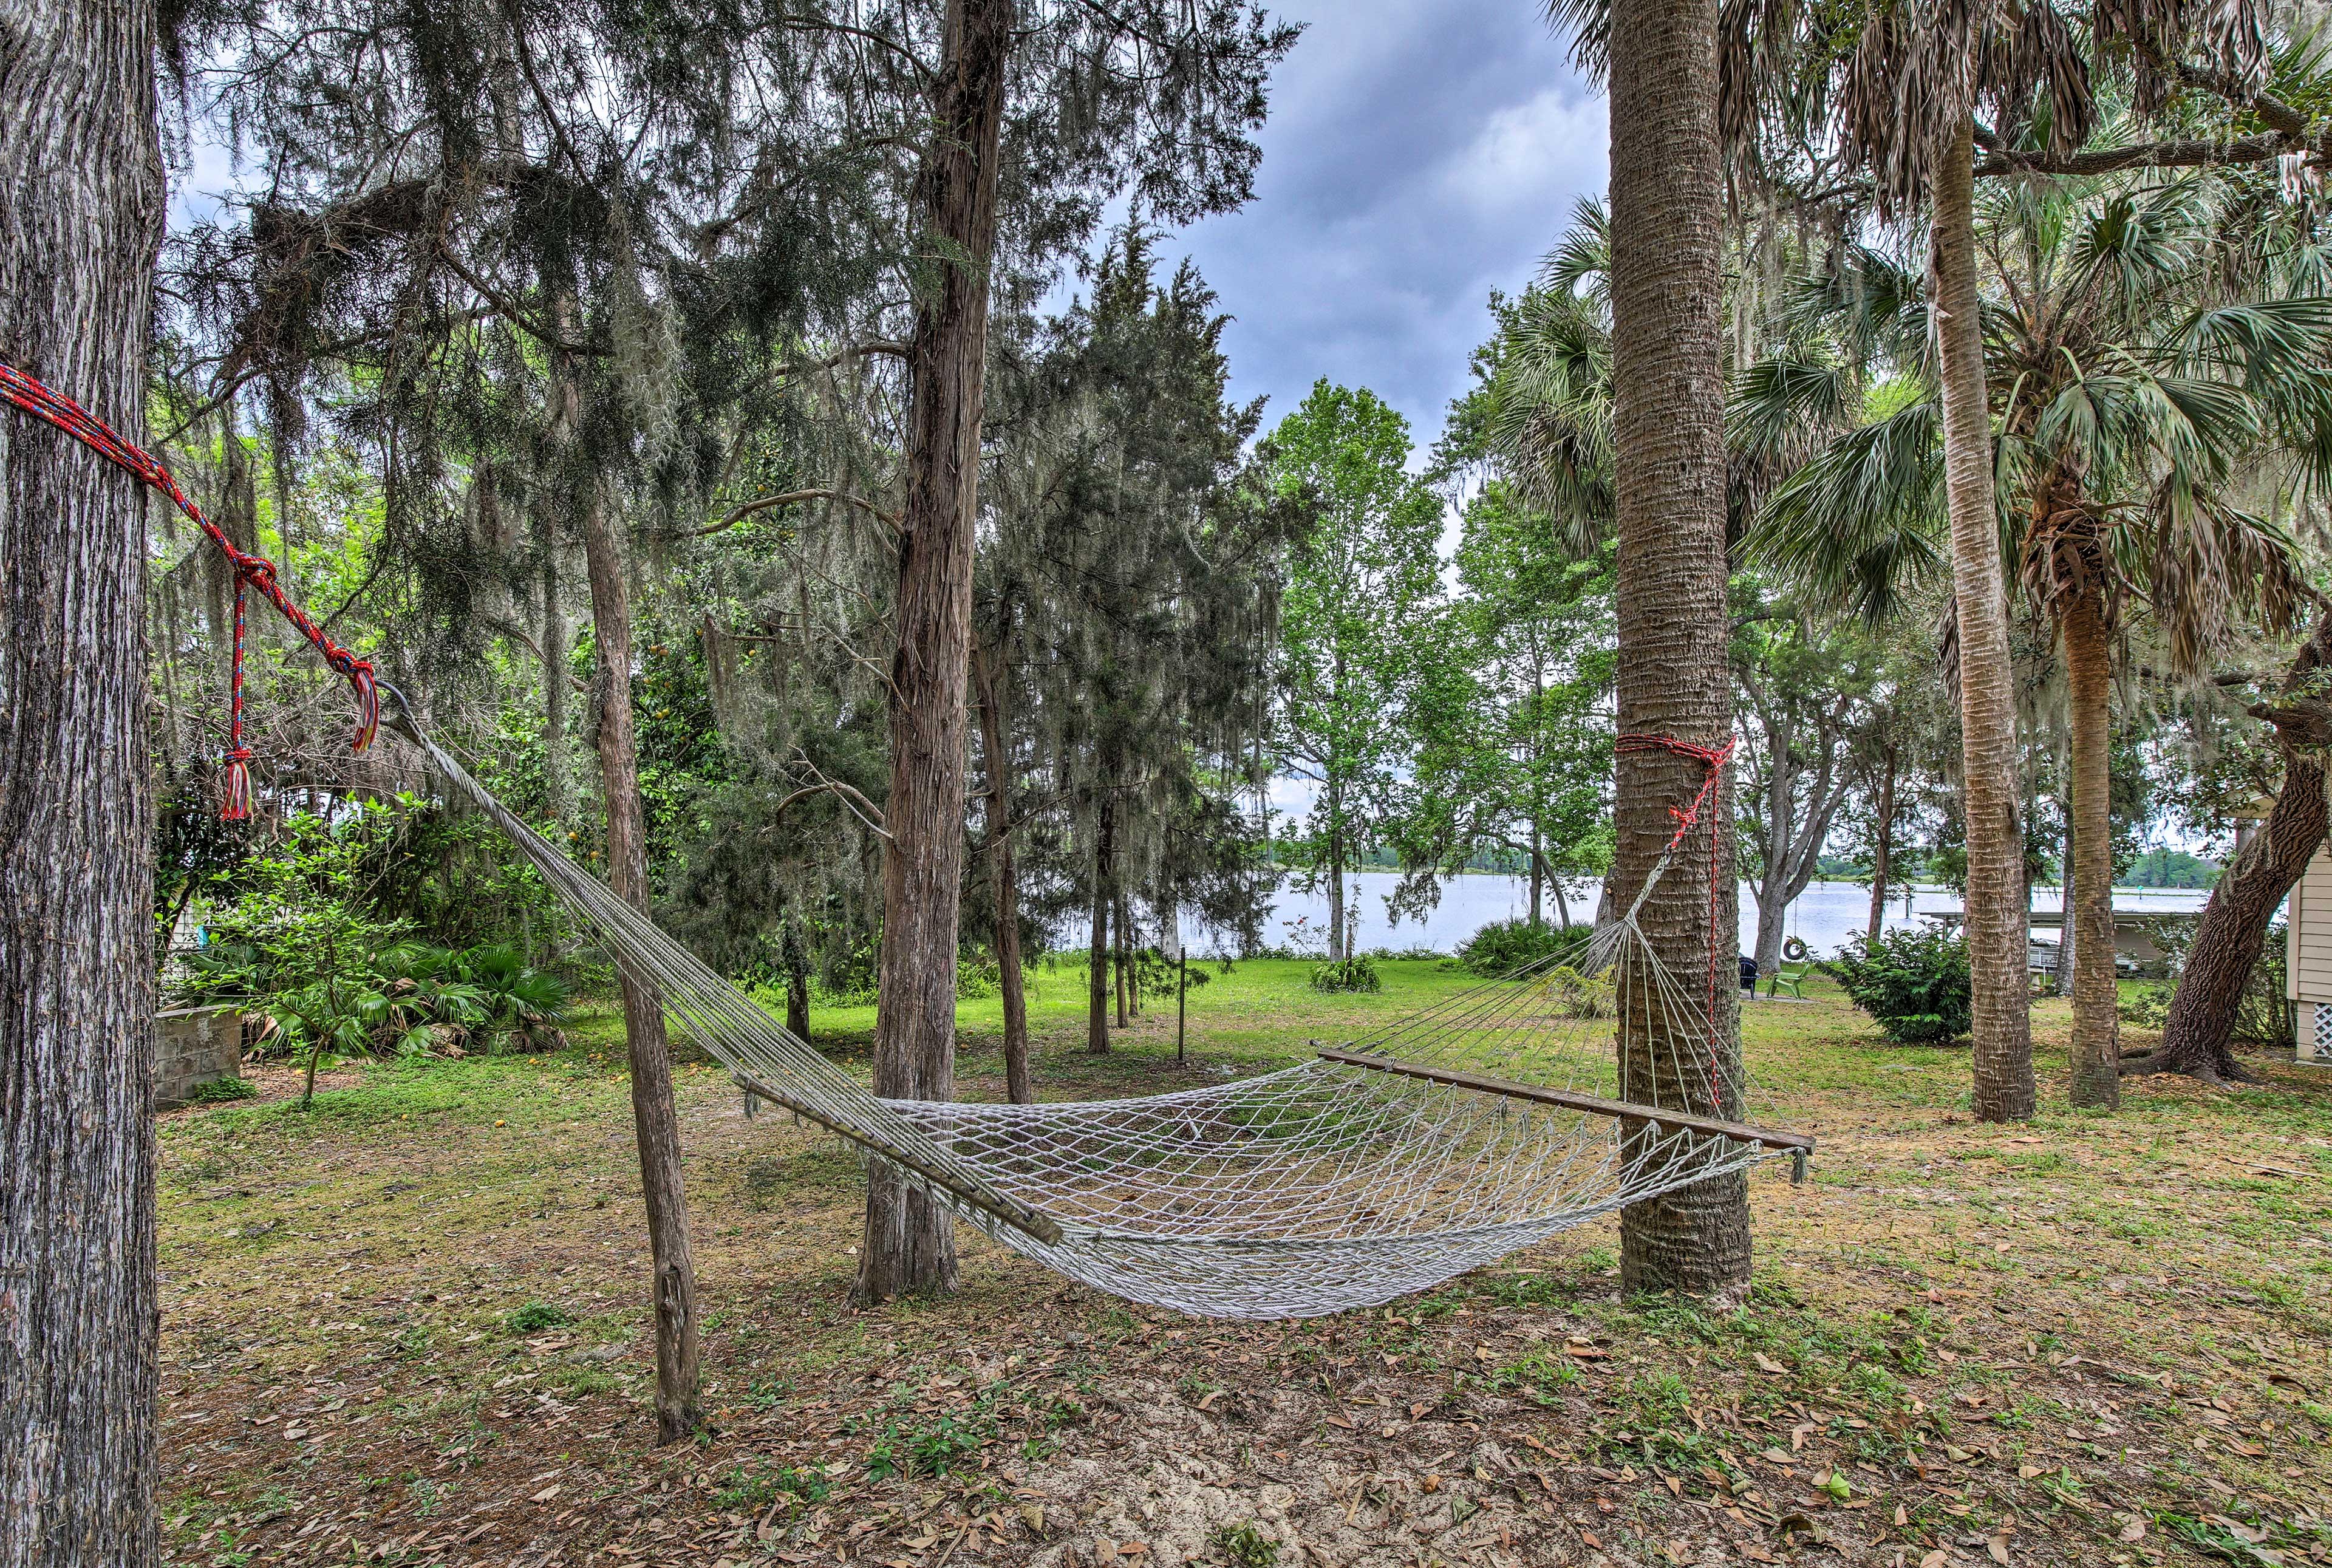 Lounge in the hammock or swing in the tire swing!